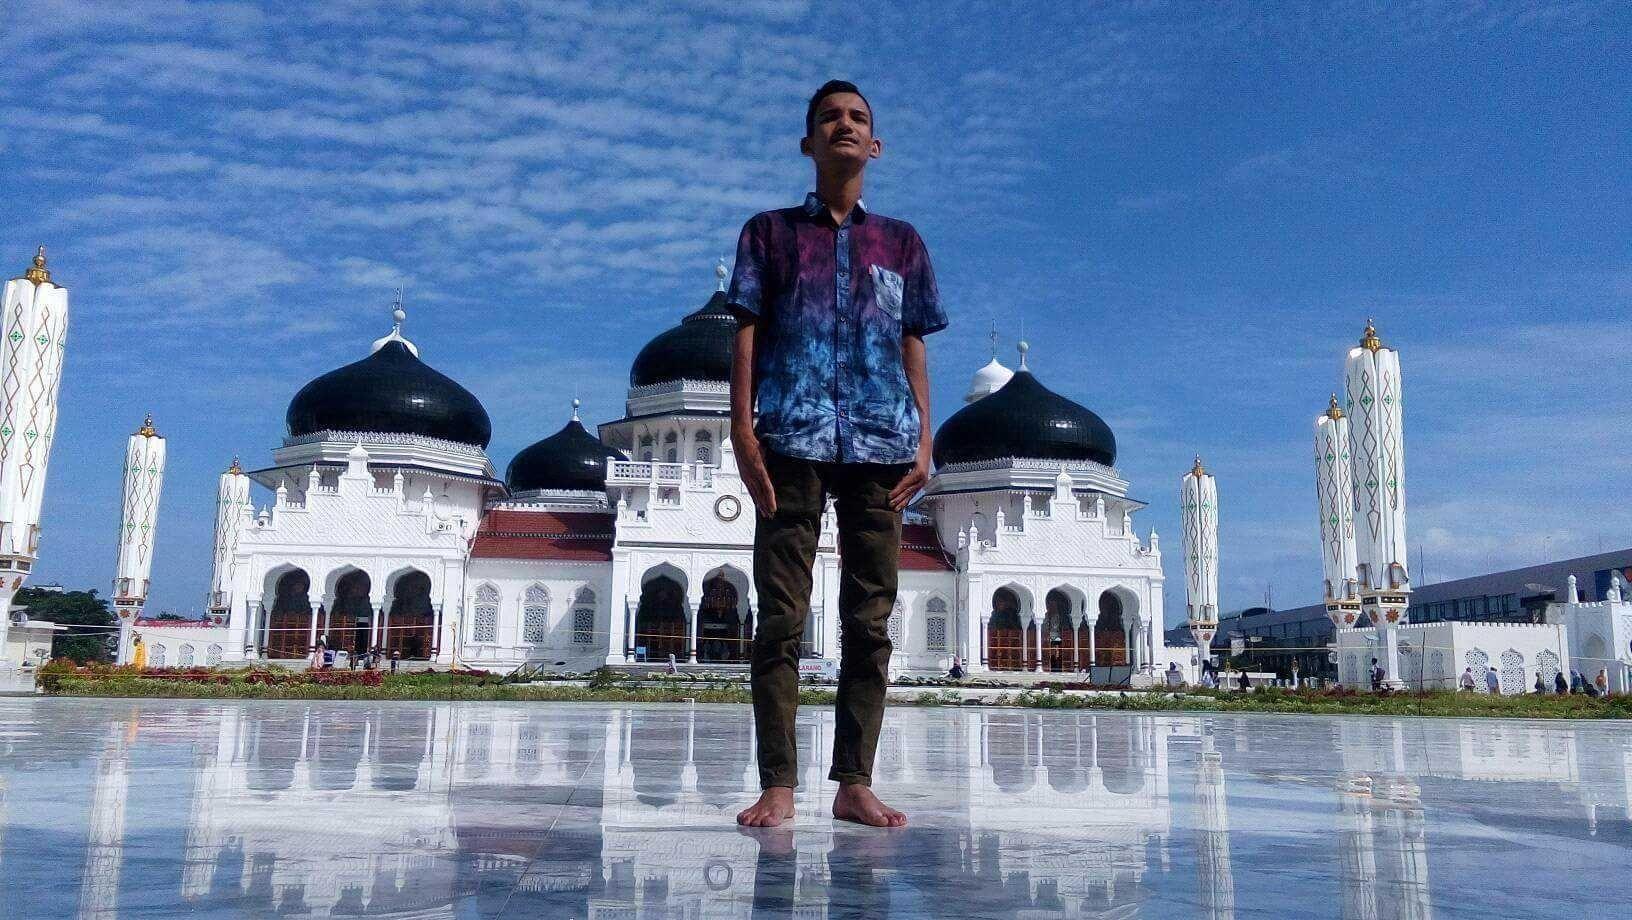 Mesjid Raya Baiturrahman Banda Aceh Steemit Menyerang Kesultanan Agresi Tentara